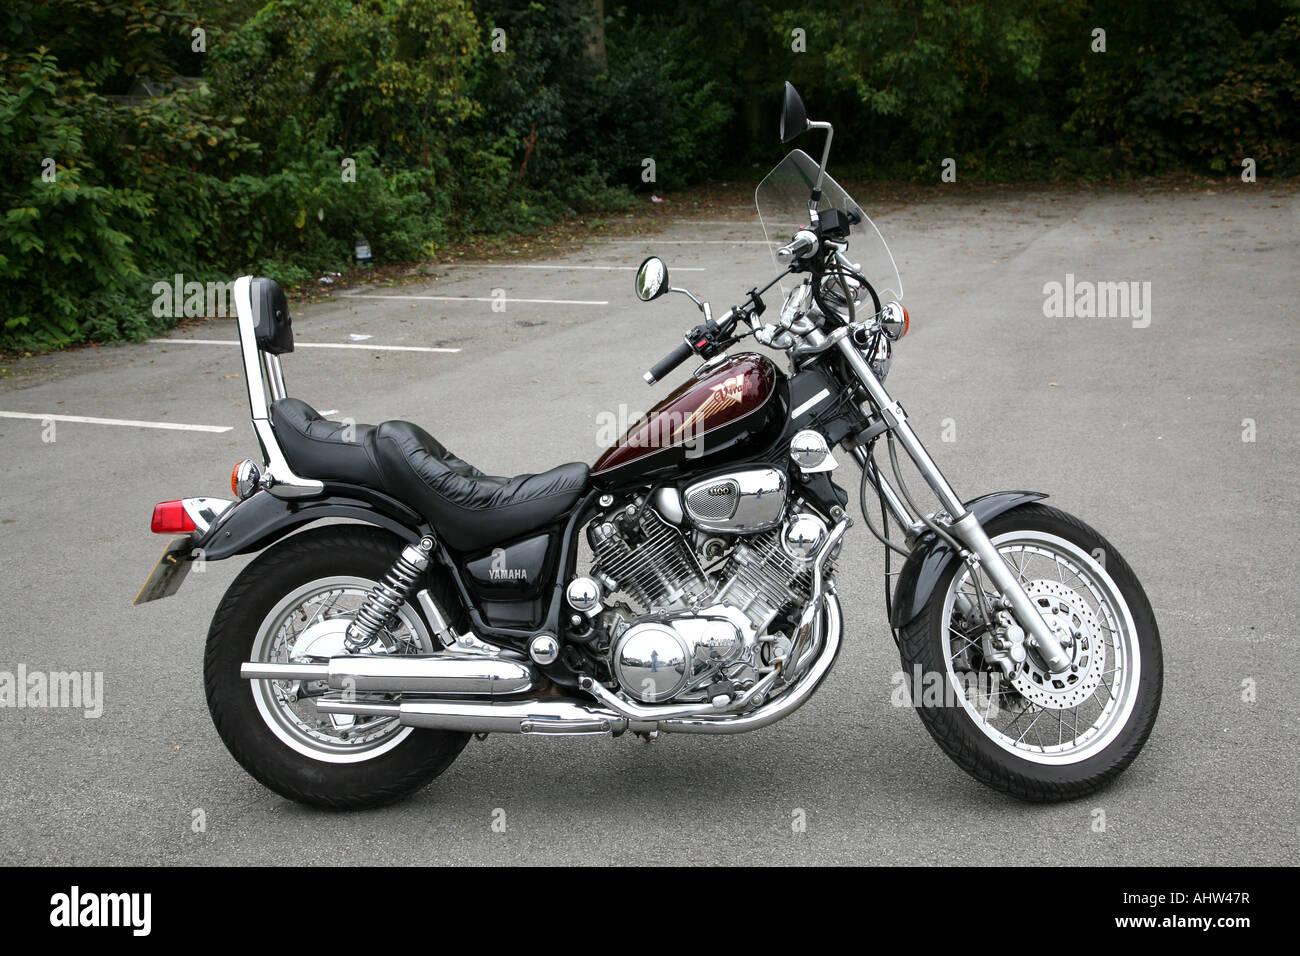 a yamaha virago 1100 motorcycle stock photo royalty free. Black Bedroom Furniture Sets. Home Design Ideas